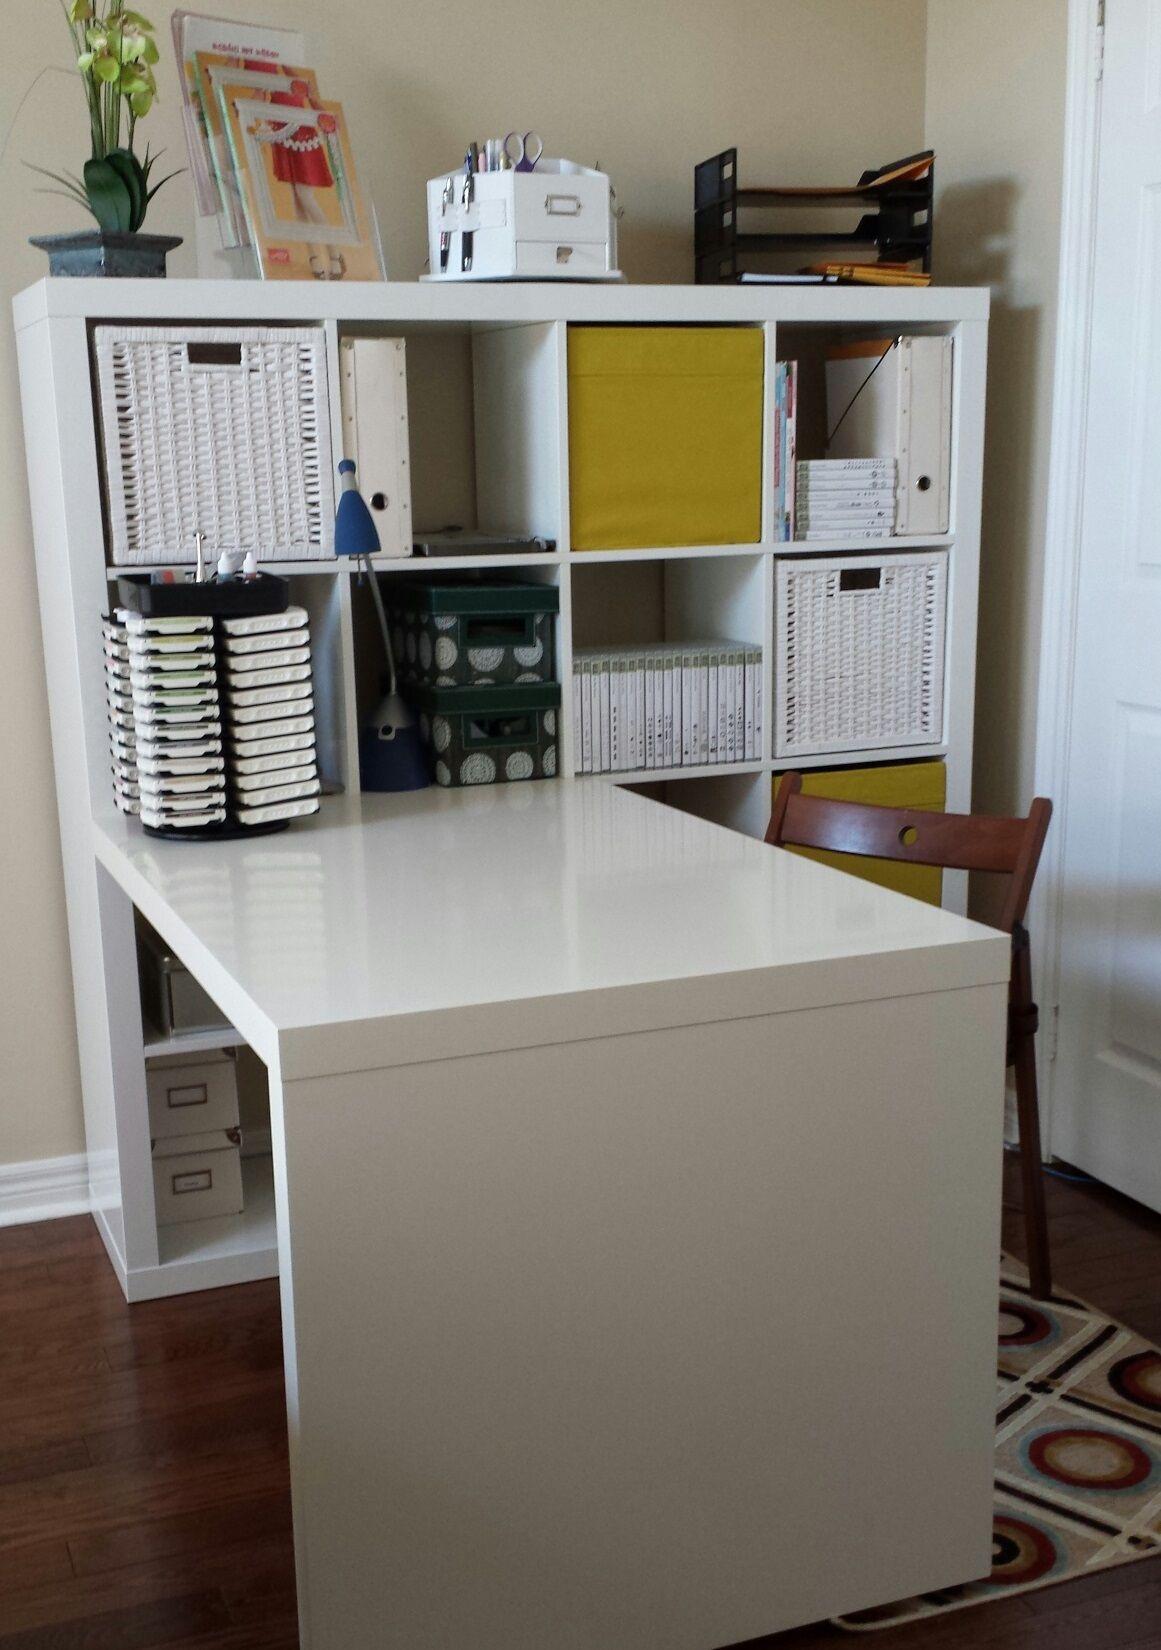 Ikea Expedit Shelf Desk For The Home Pinterest Ikea Expedit Desk Shelves Ikea Expedit Shelf